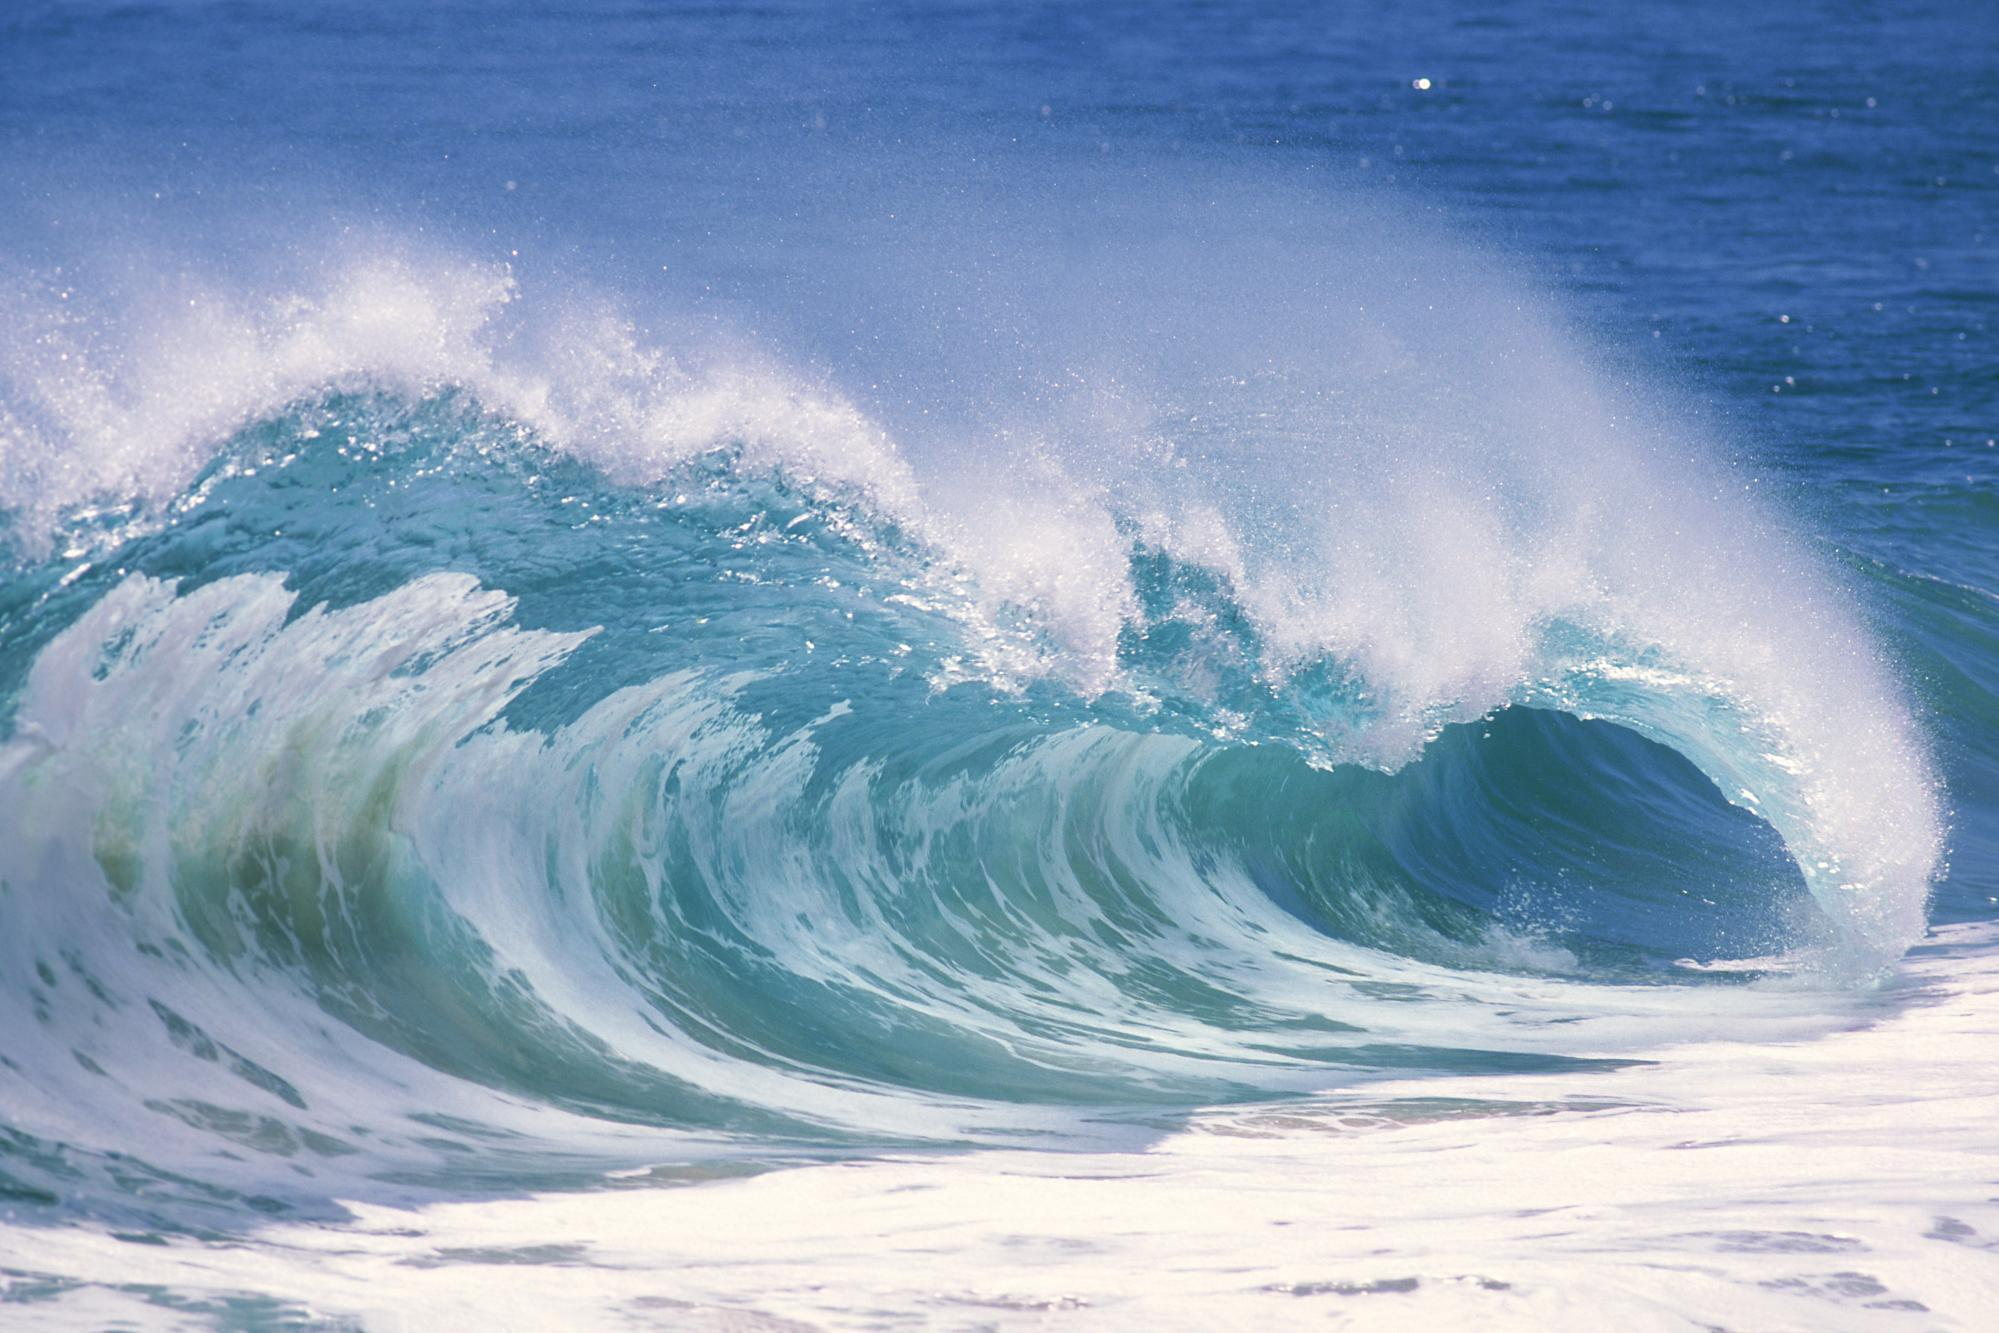 download ocean wave wallpaper which is under the ocean wallpapers 1999x1333